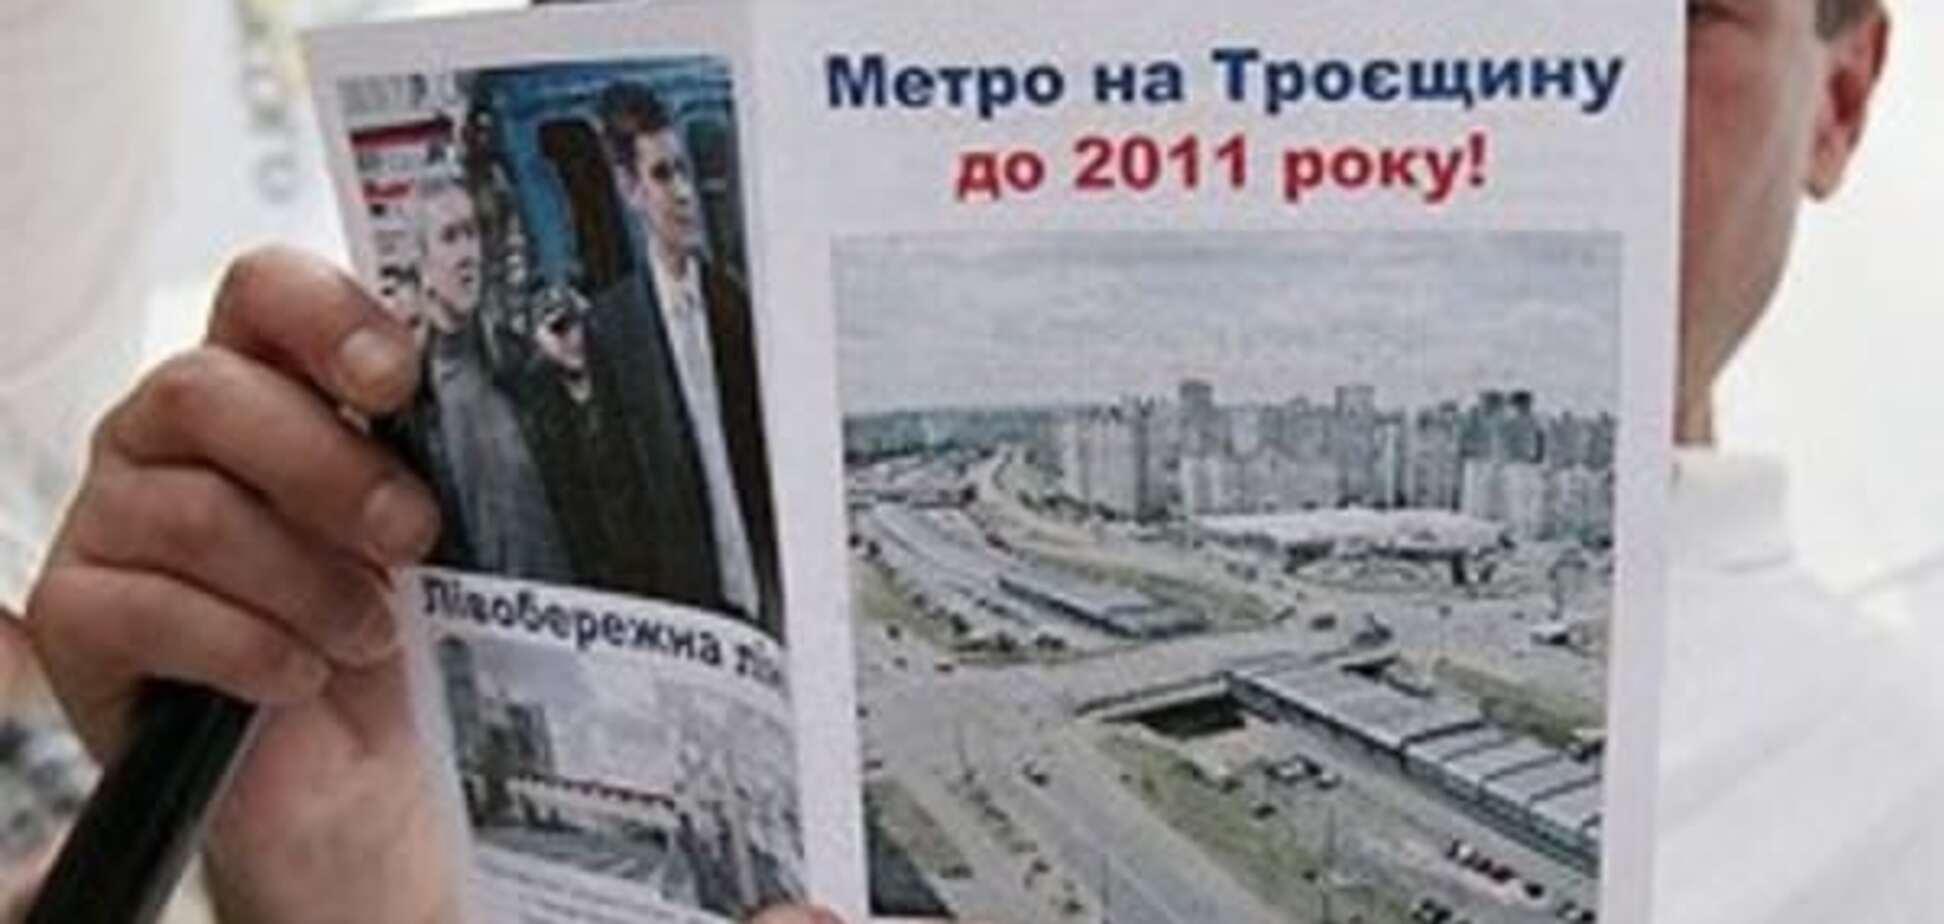 Новое обещание: метро на Троещину построят через три года